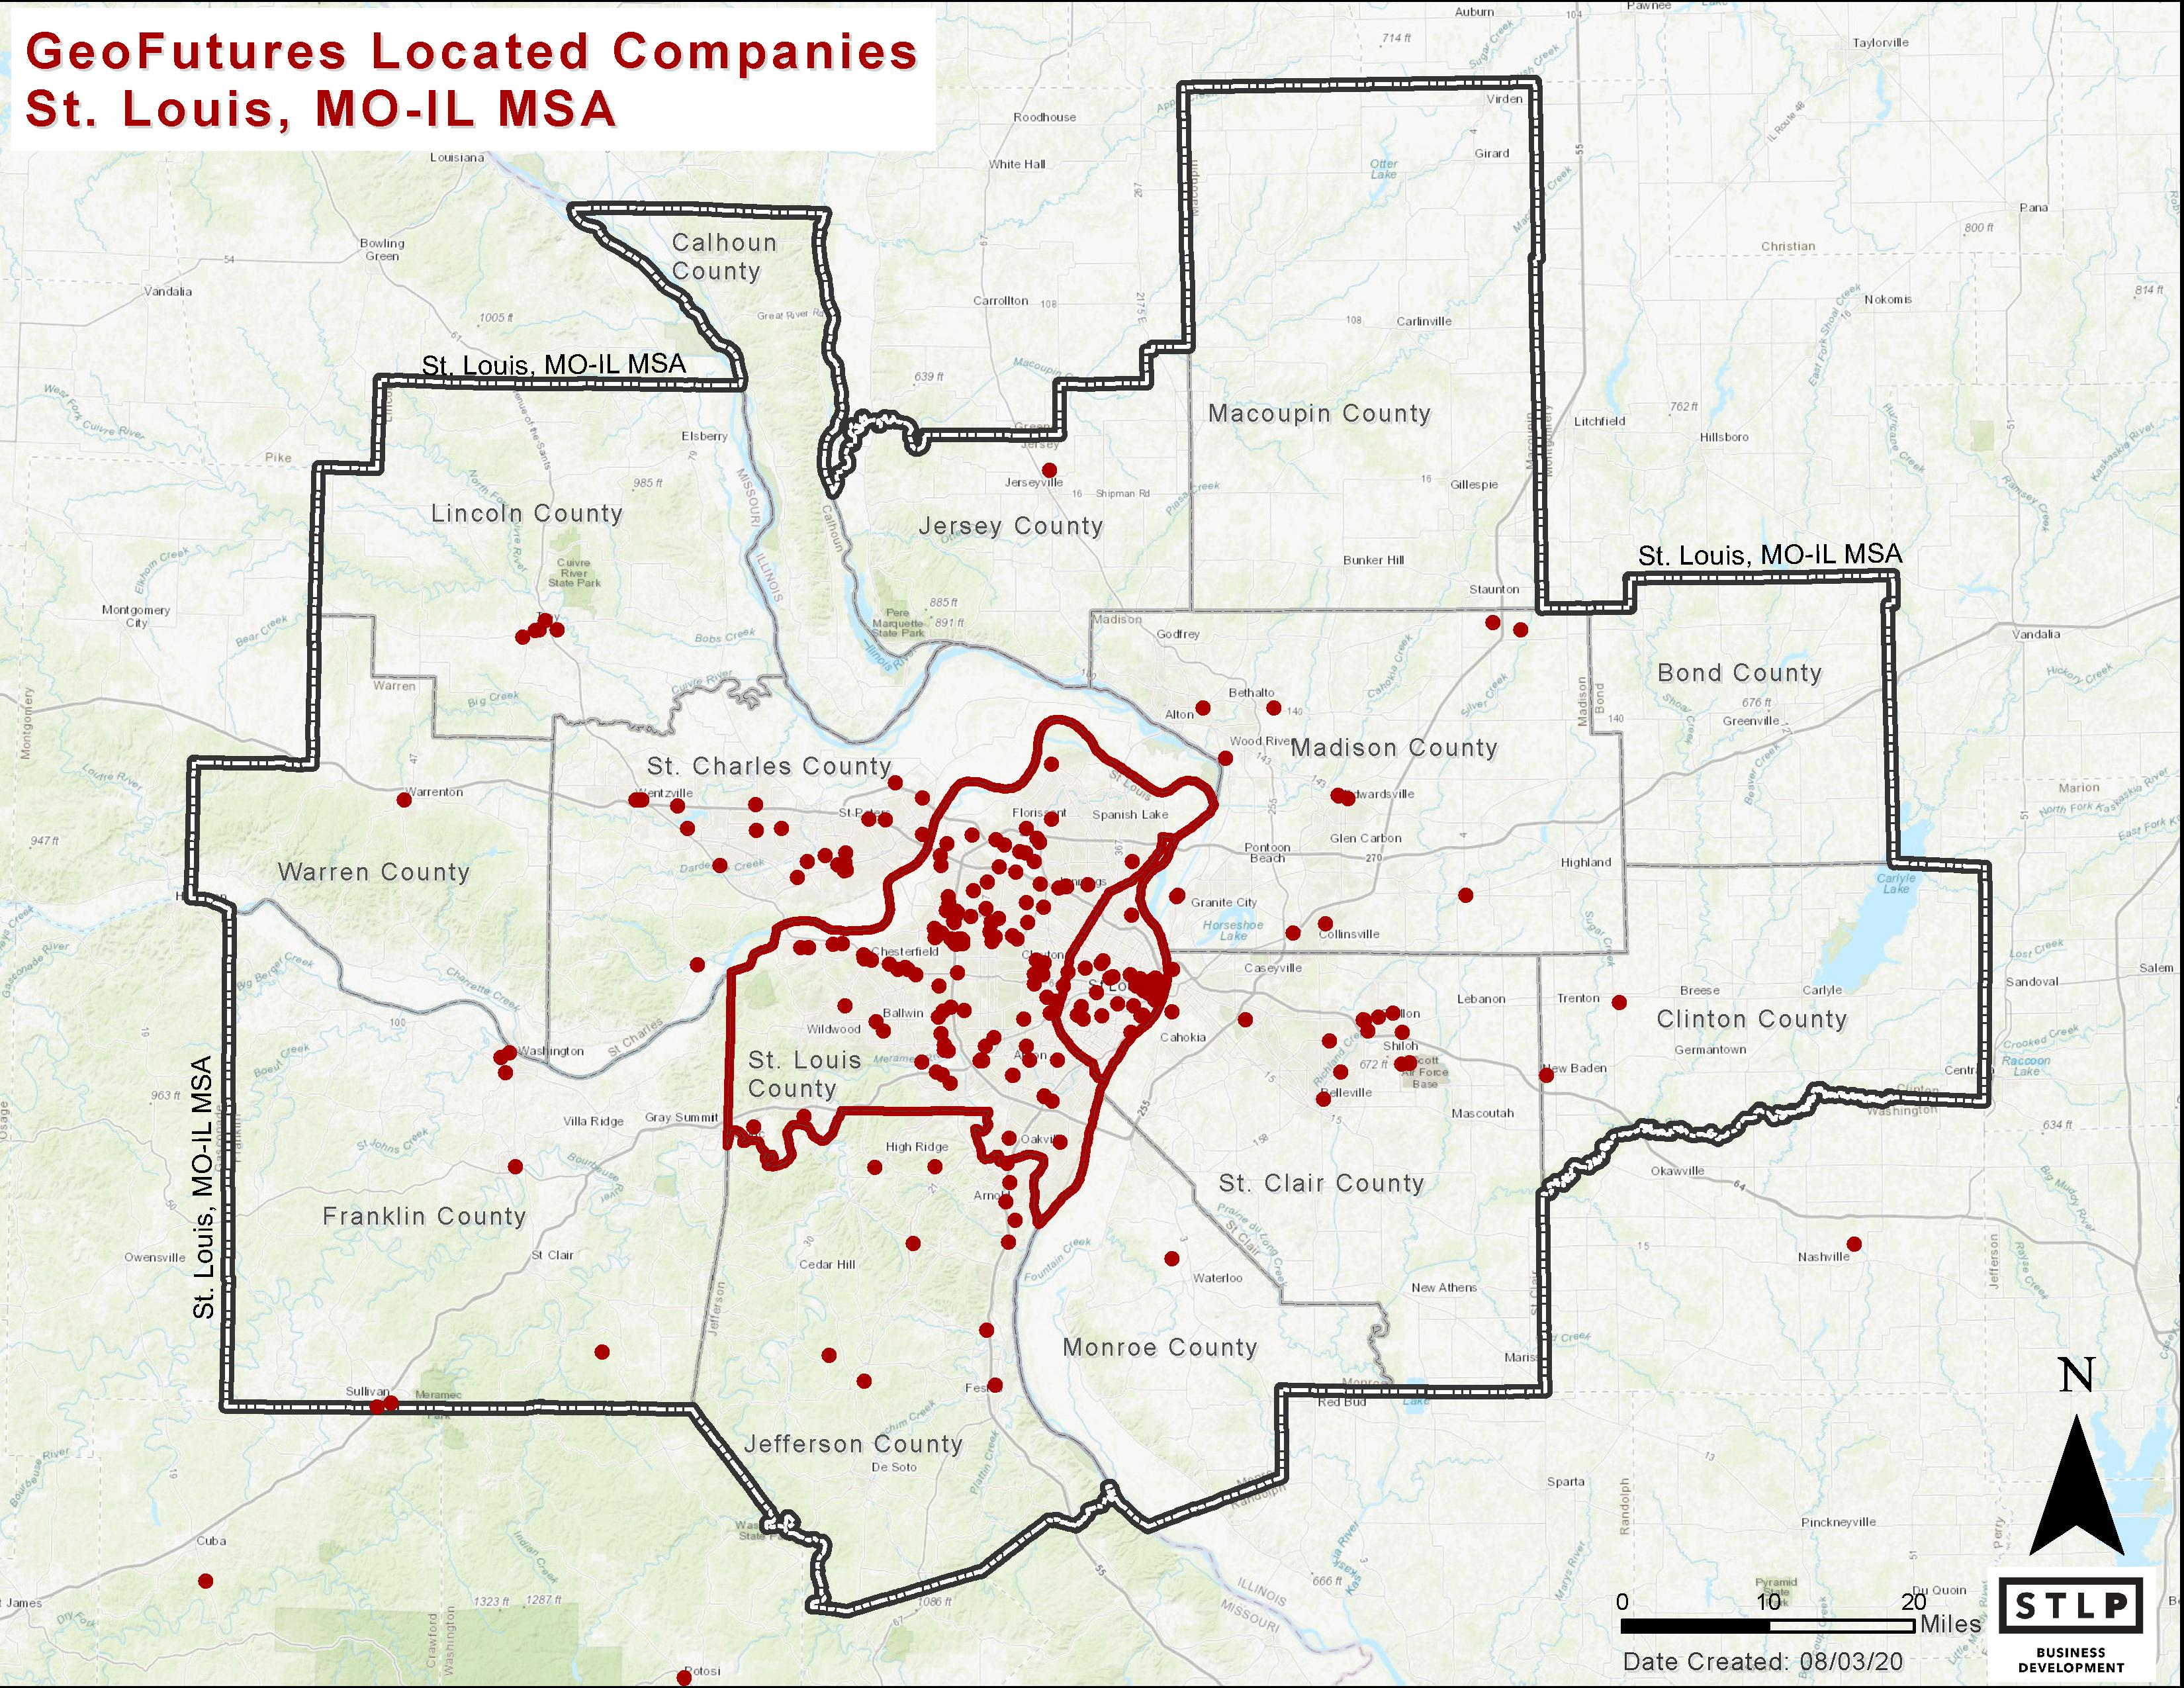 Geospatial Company Cluster in STL